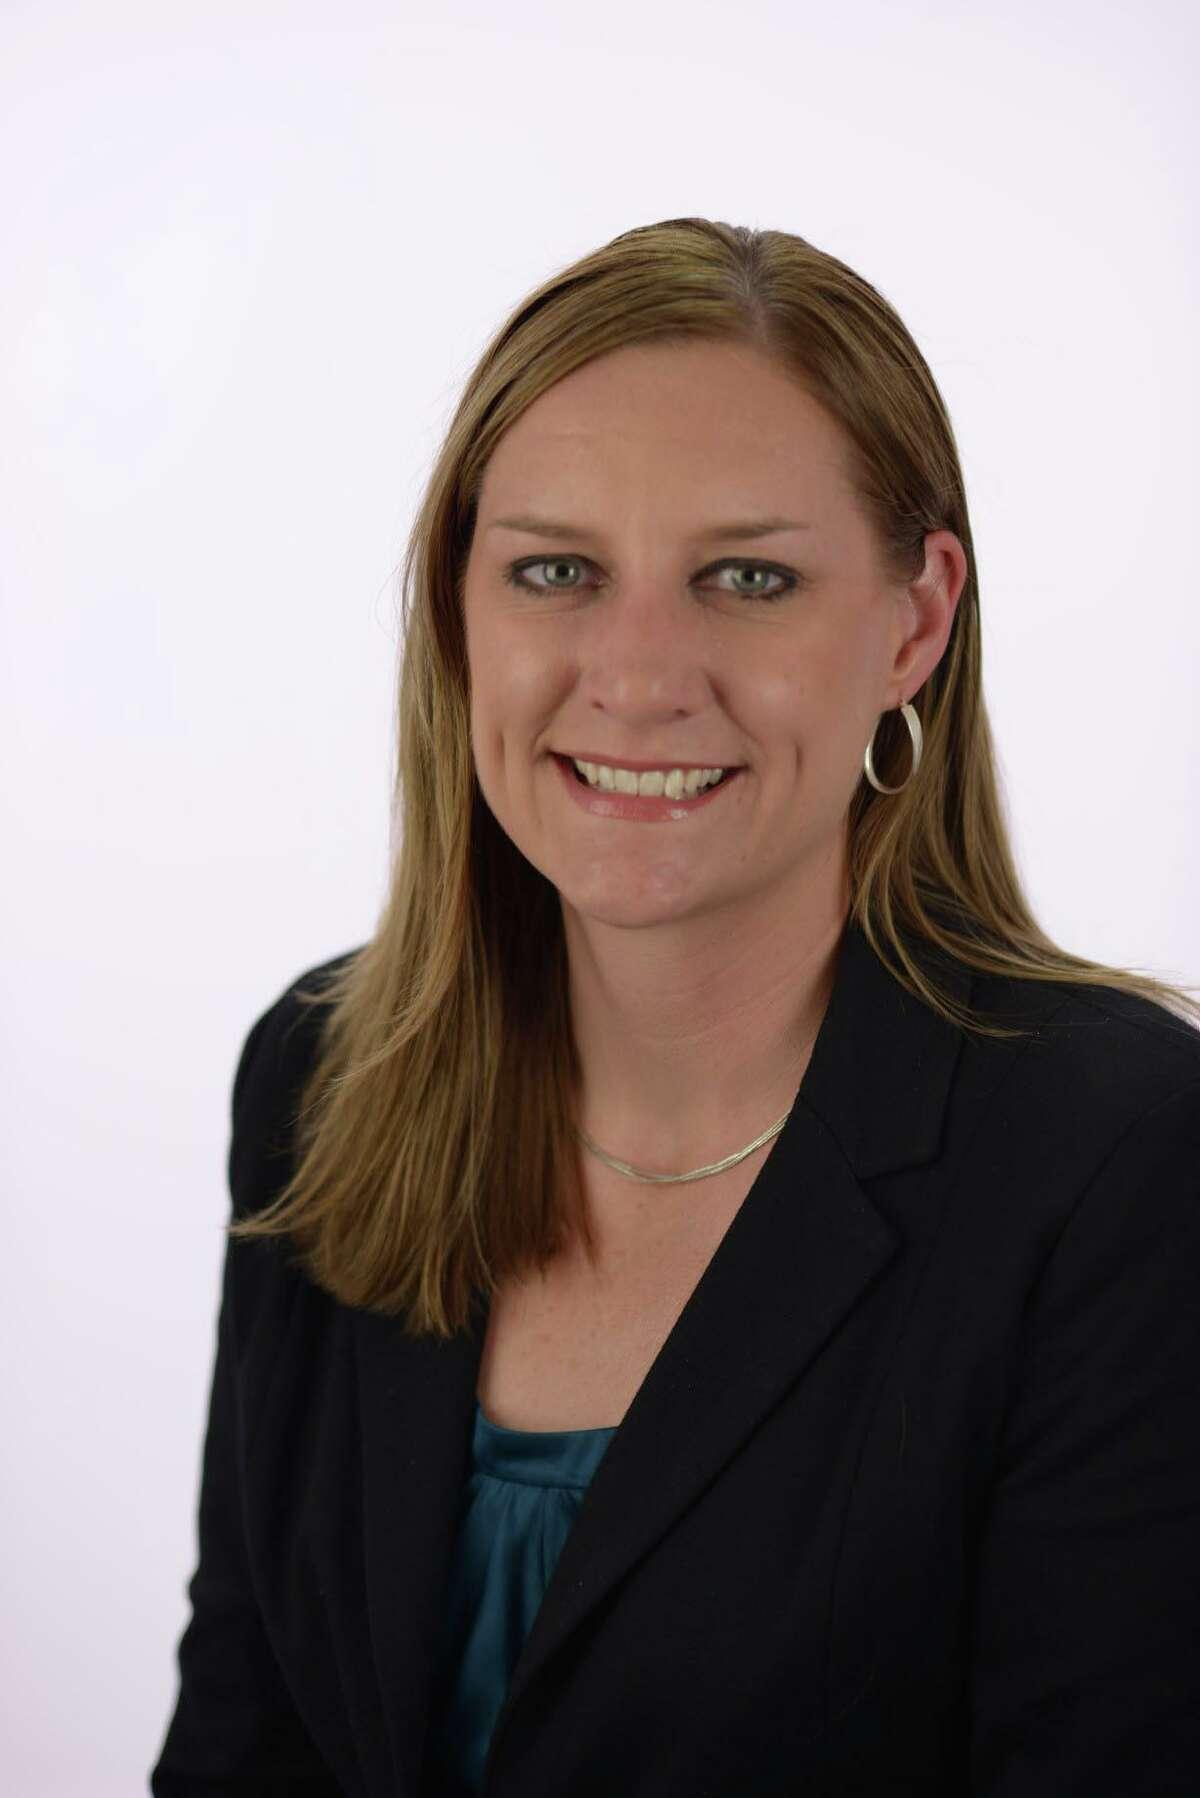 Elisabeth Joyce is vice president of advisory in Gartner's HR practice.